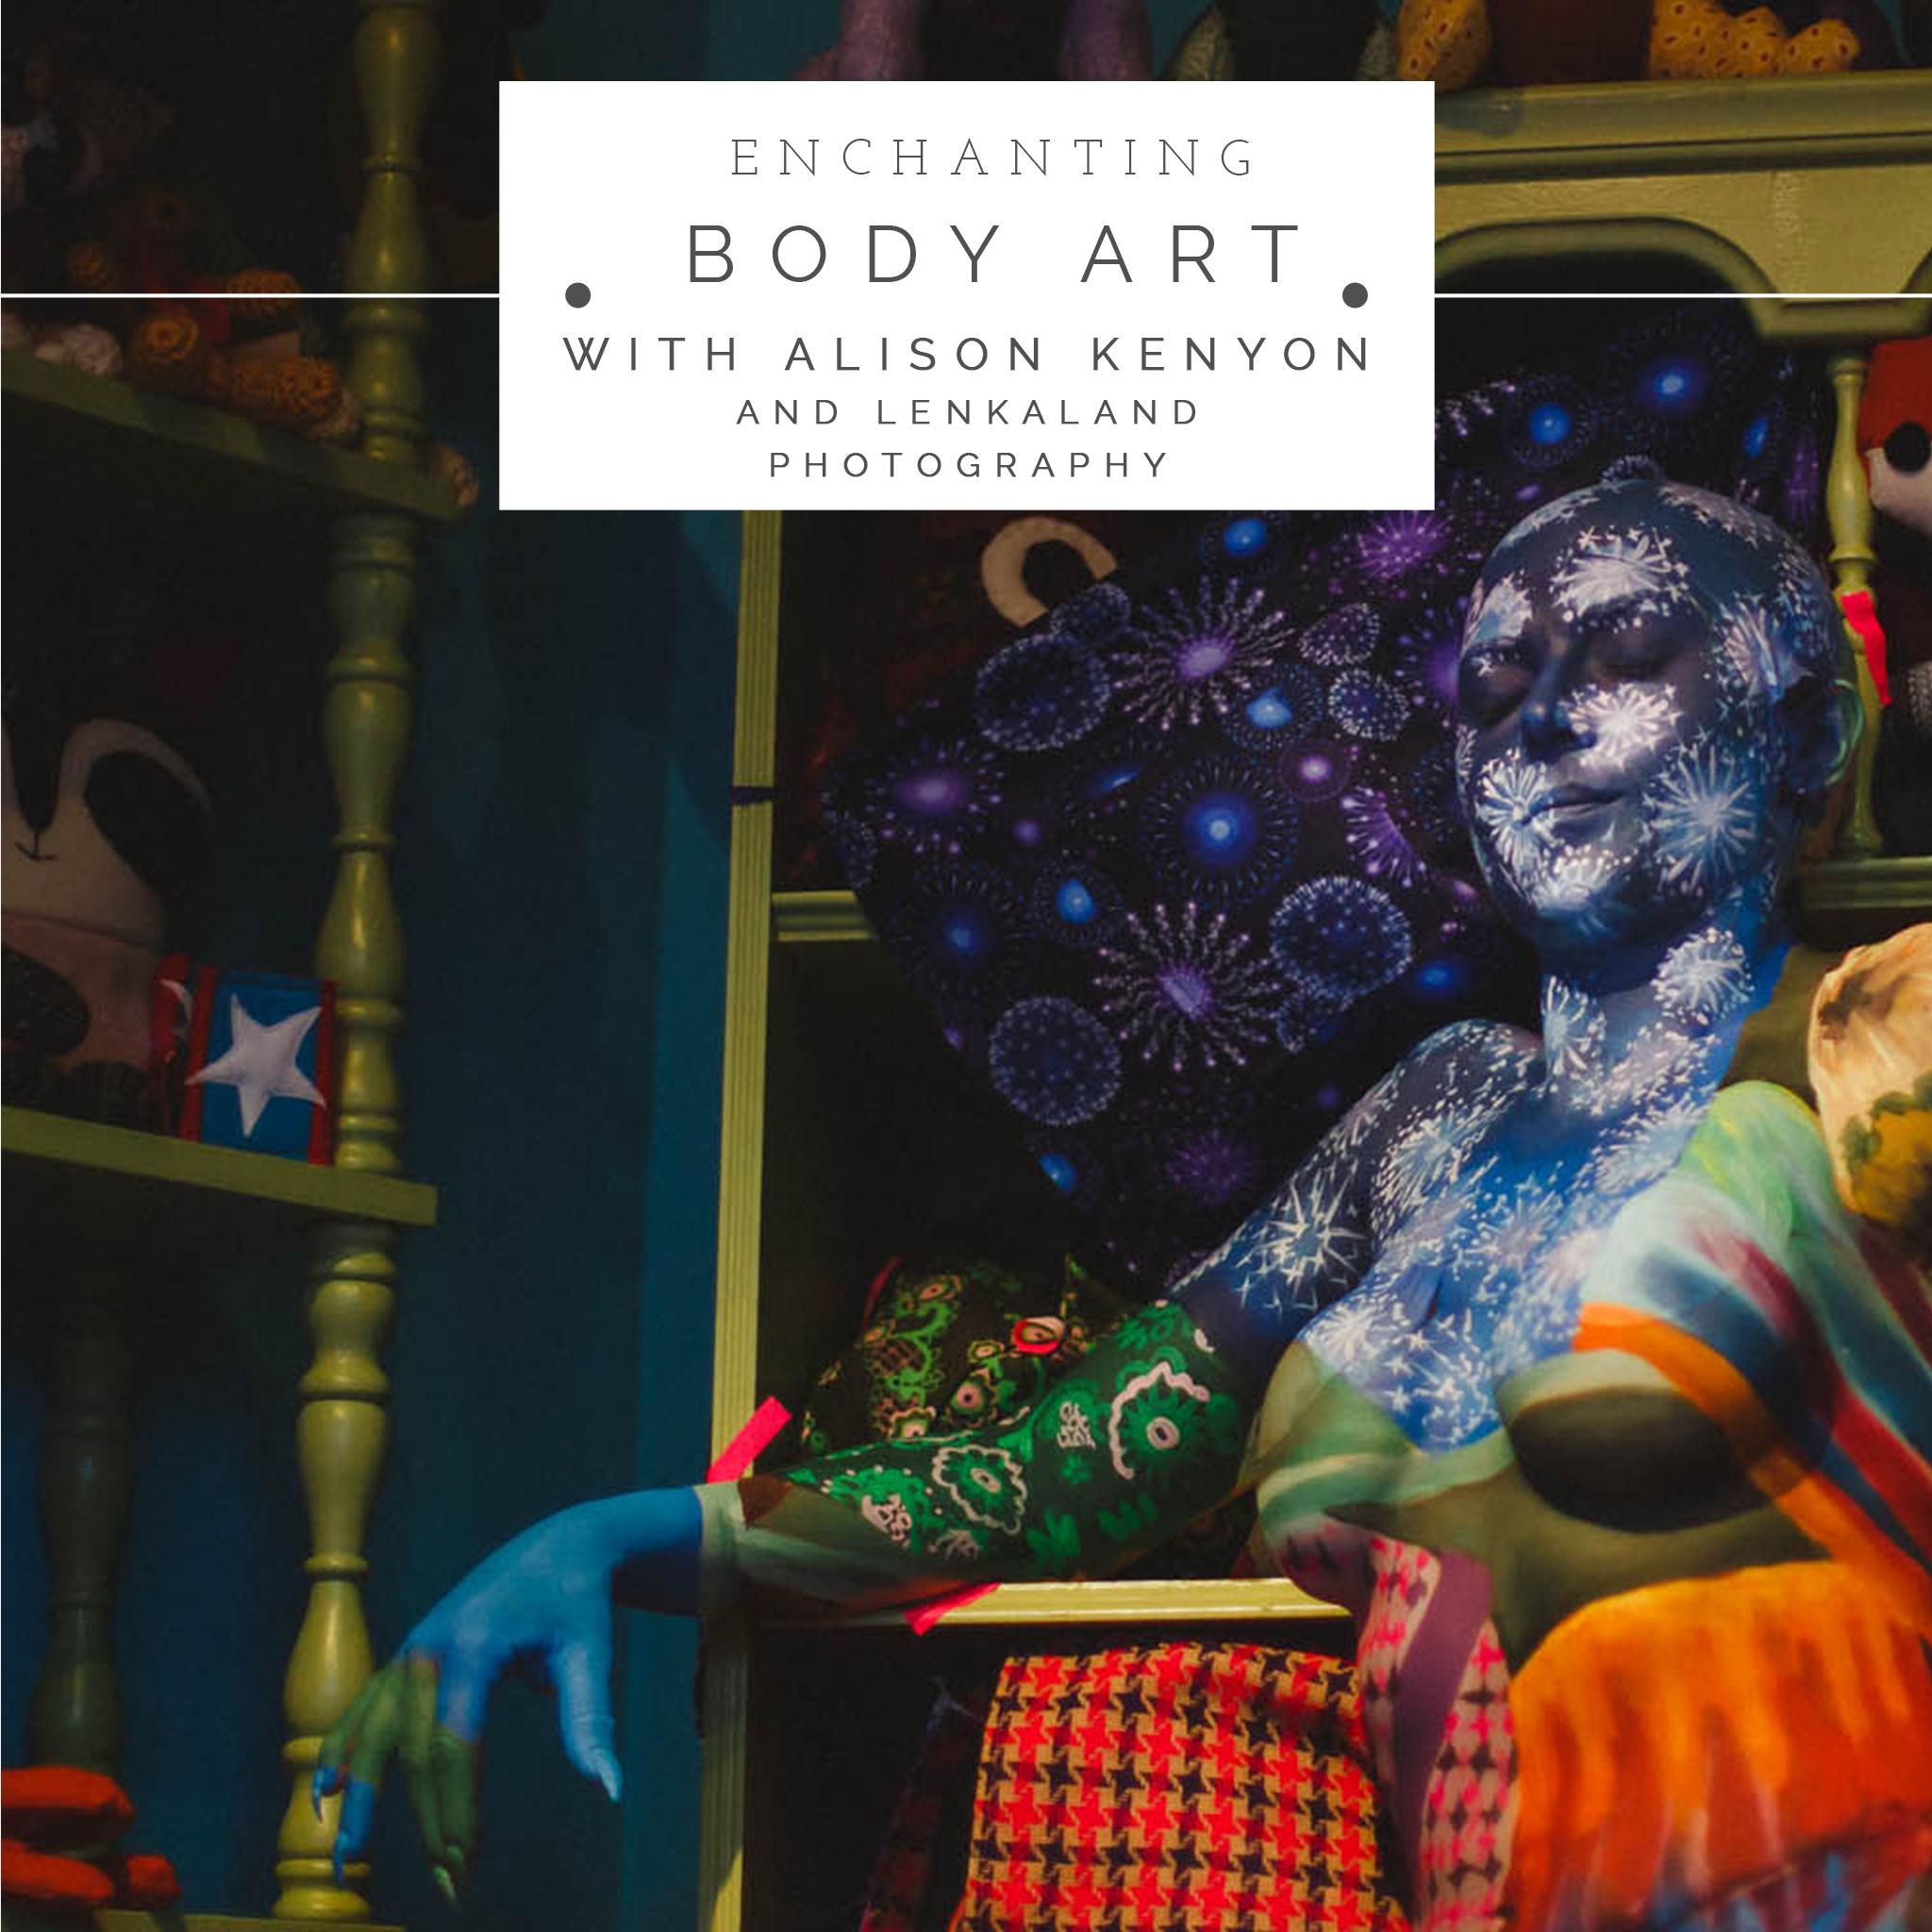 Enchanting Body Art with Alison Kenyon